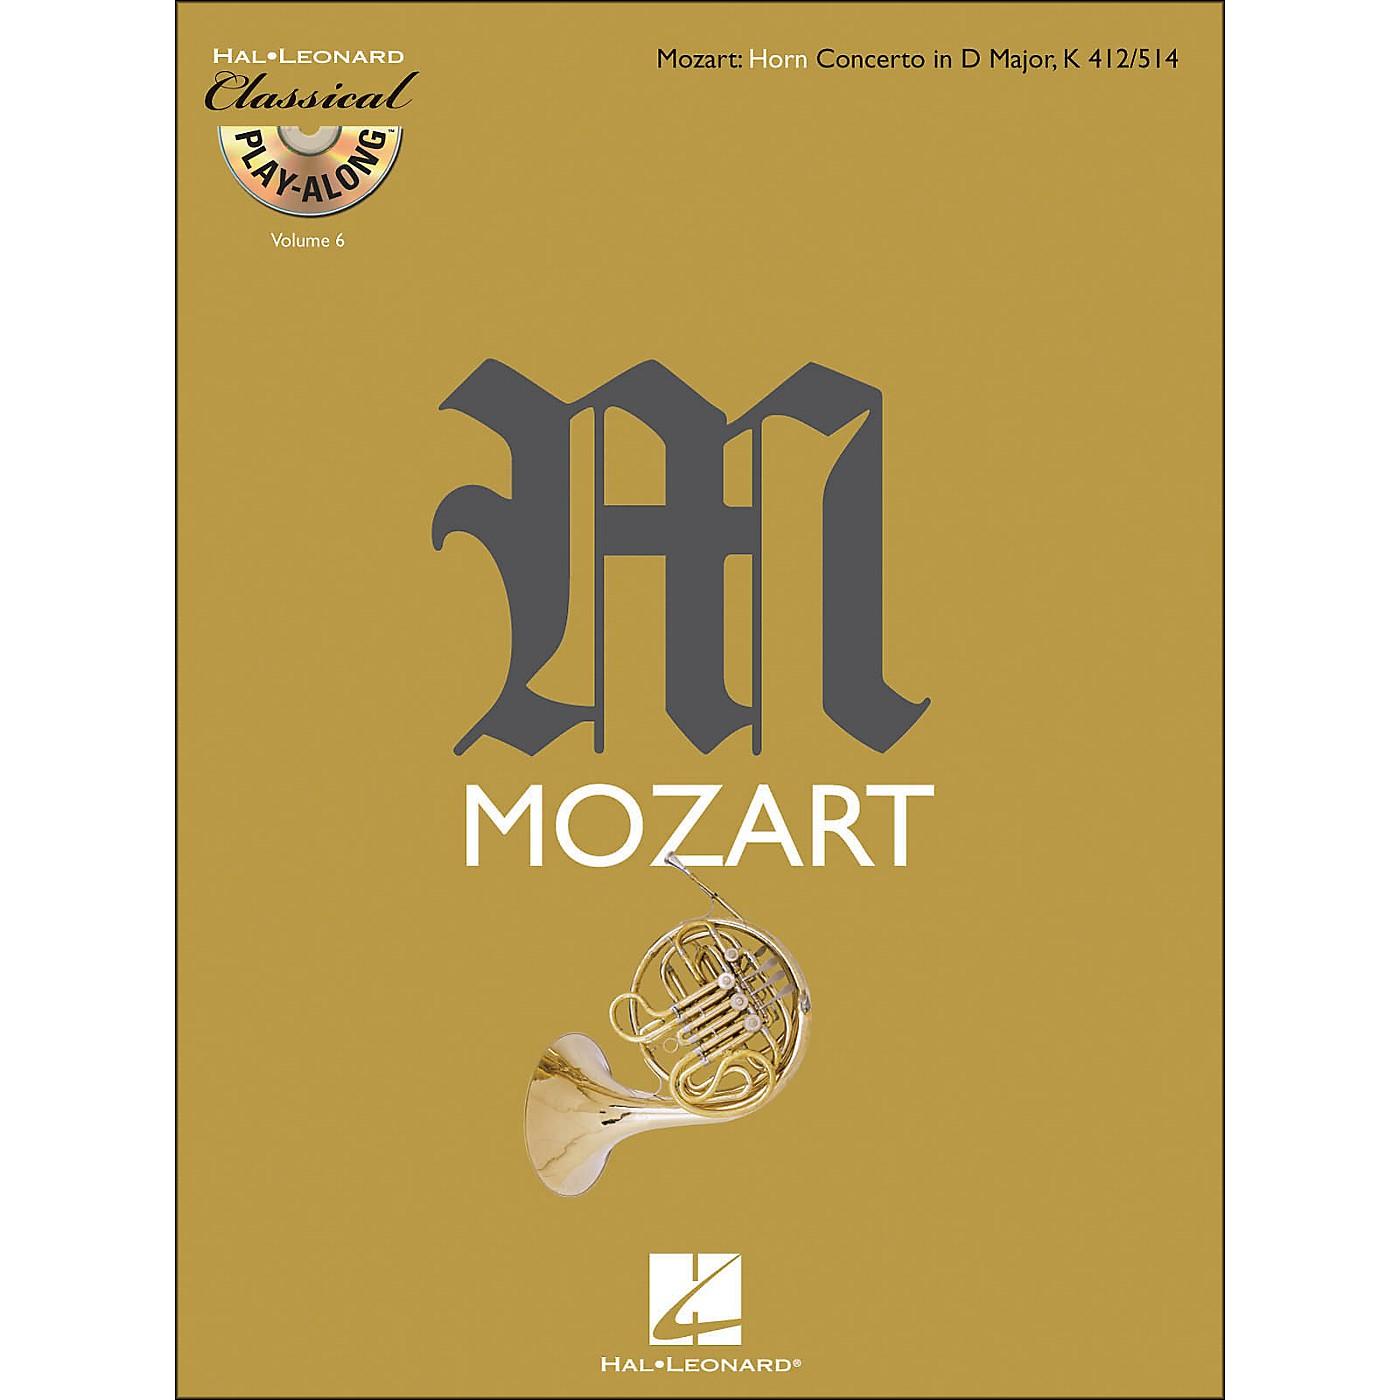 Hal Leonard Mozart: Horn Concerto In D Major, Kv 412/514 Classical Play-Along Book/CD Vol.6 thumbnail